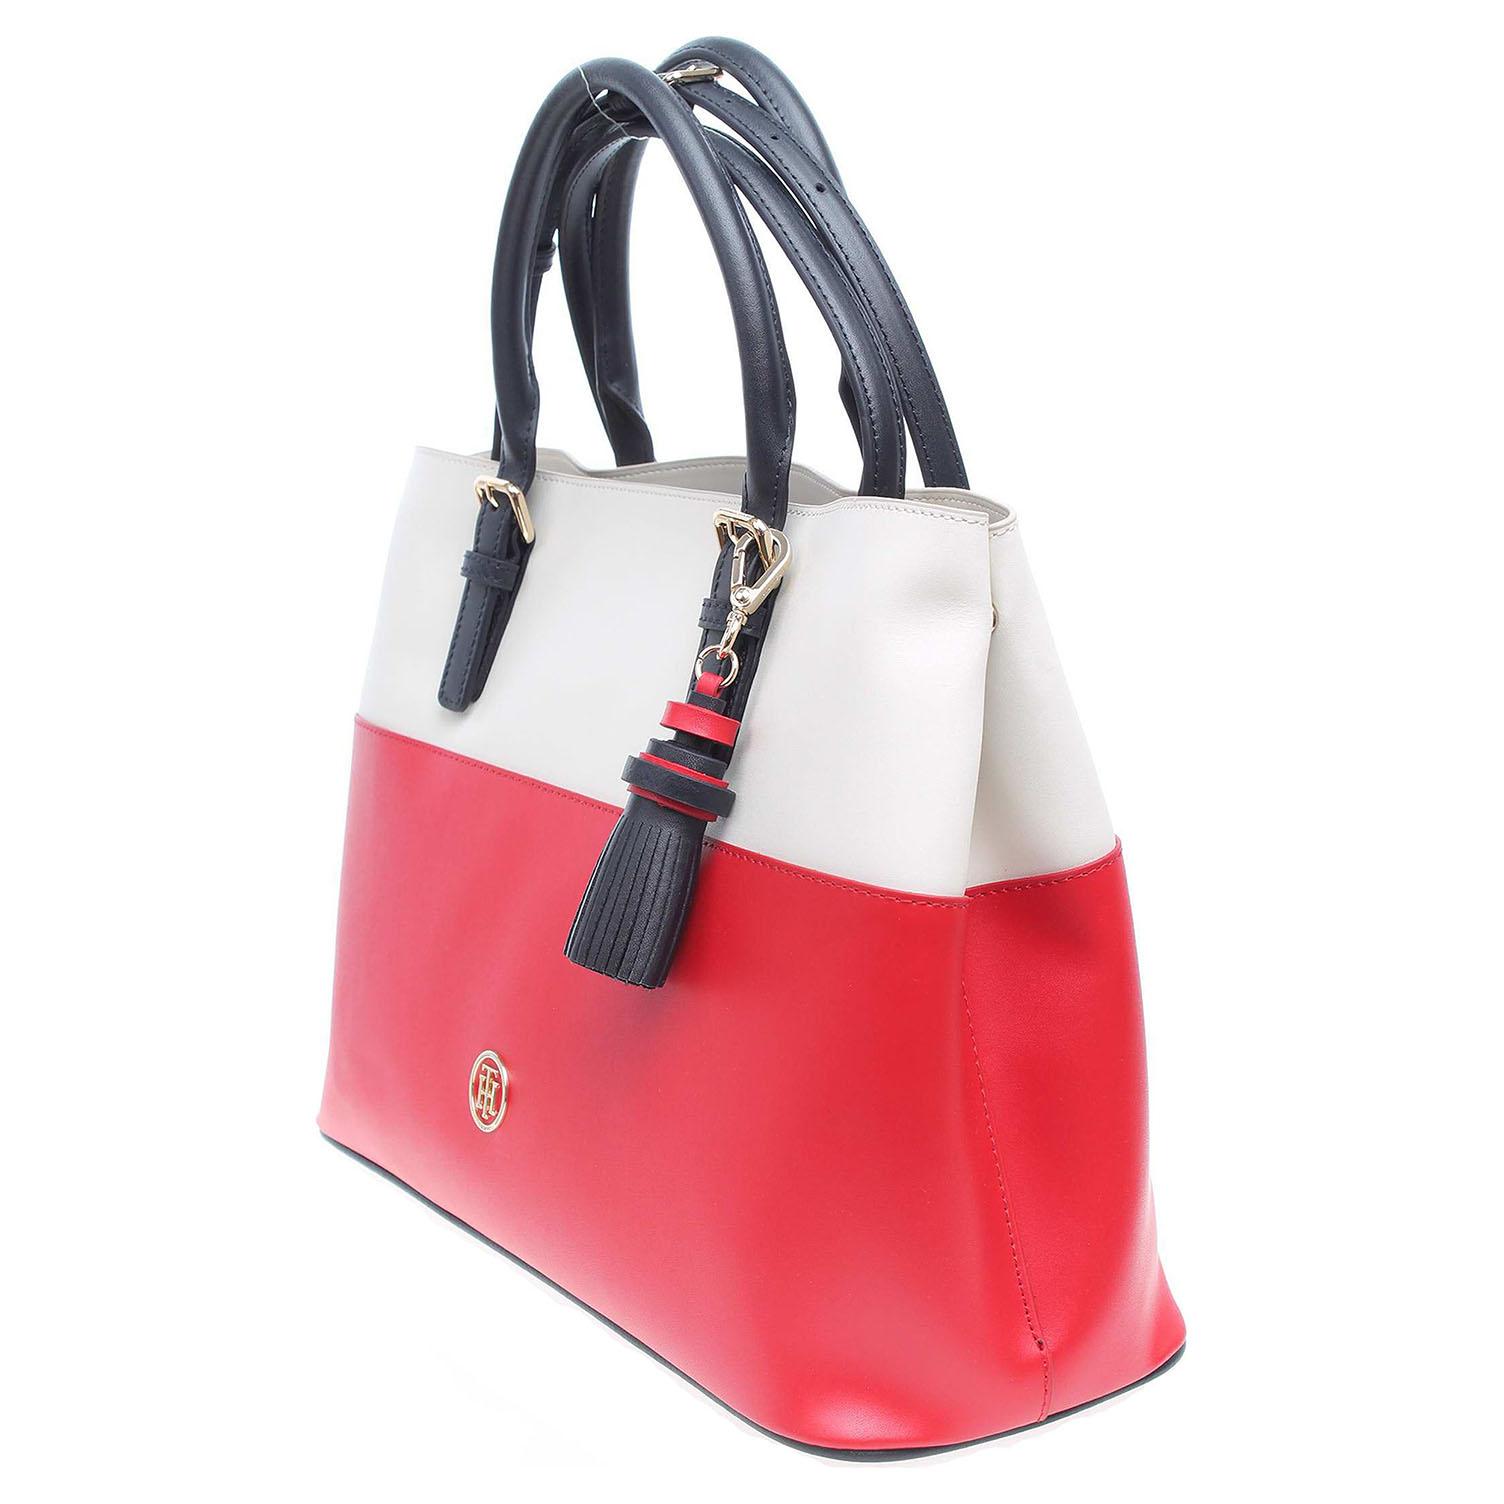 Ecco Tommy Hilfiger dámská kabelka AW0AW04047 červená-bílá 11891140